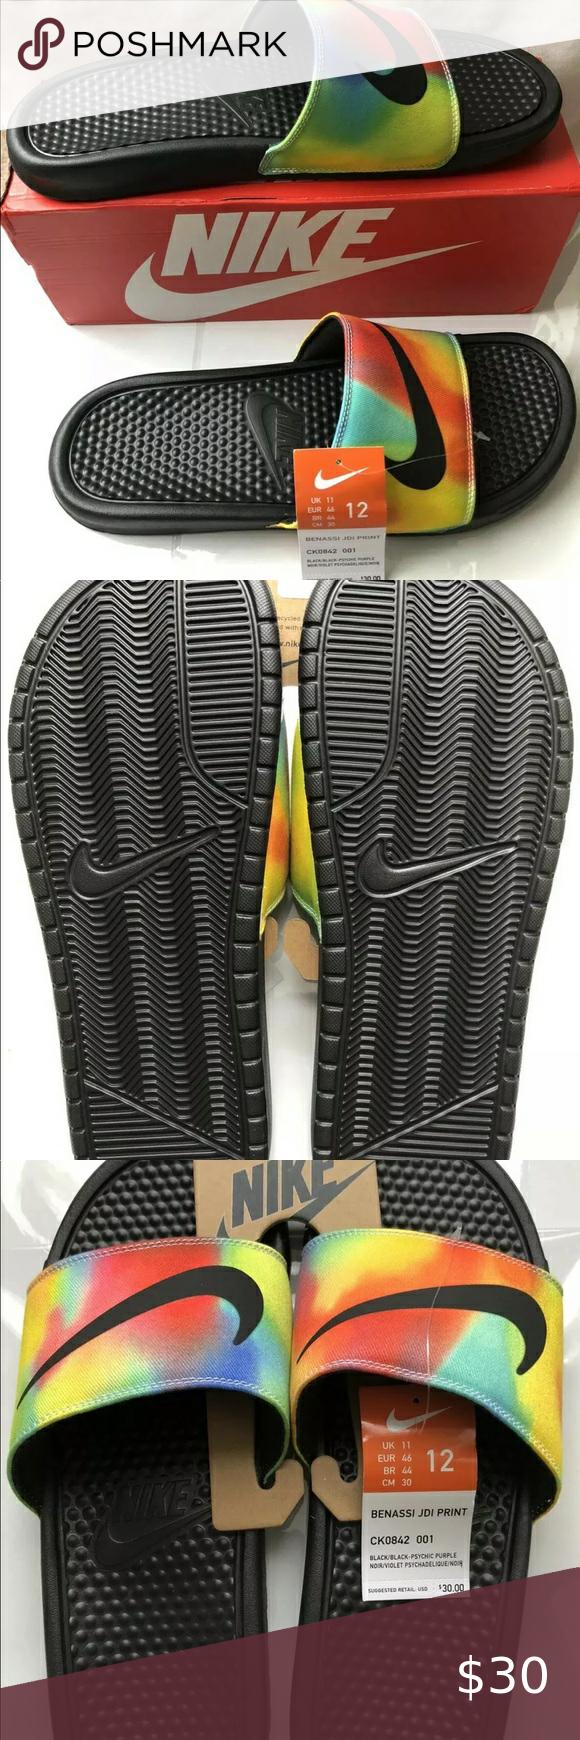 NIKE Slide Sandals Tie Dye Men's Size 12 NIKE Benassi JDI PRINT Slide Sandals CK0842-001 Tie Dye Men's Size 12 Nike Shoes Sandals & Flip-Flops